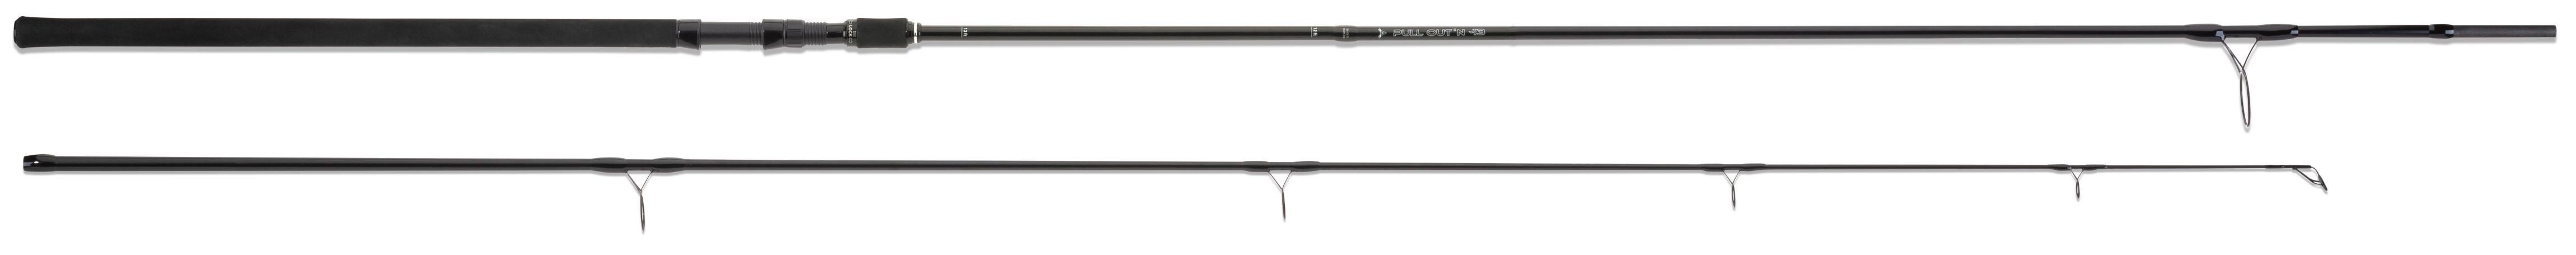 Anaconda prut Xtasy Pull Out'N- Series 13-14 ft/3,75 lb